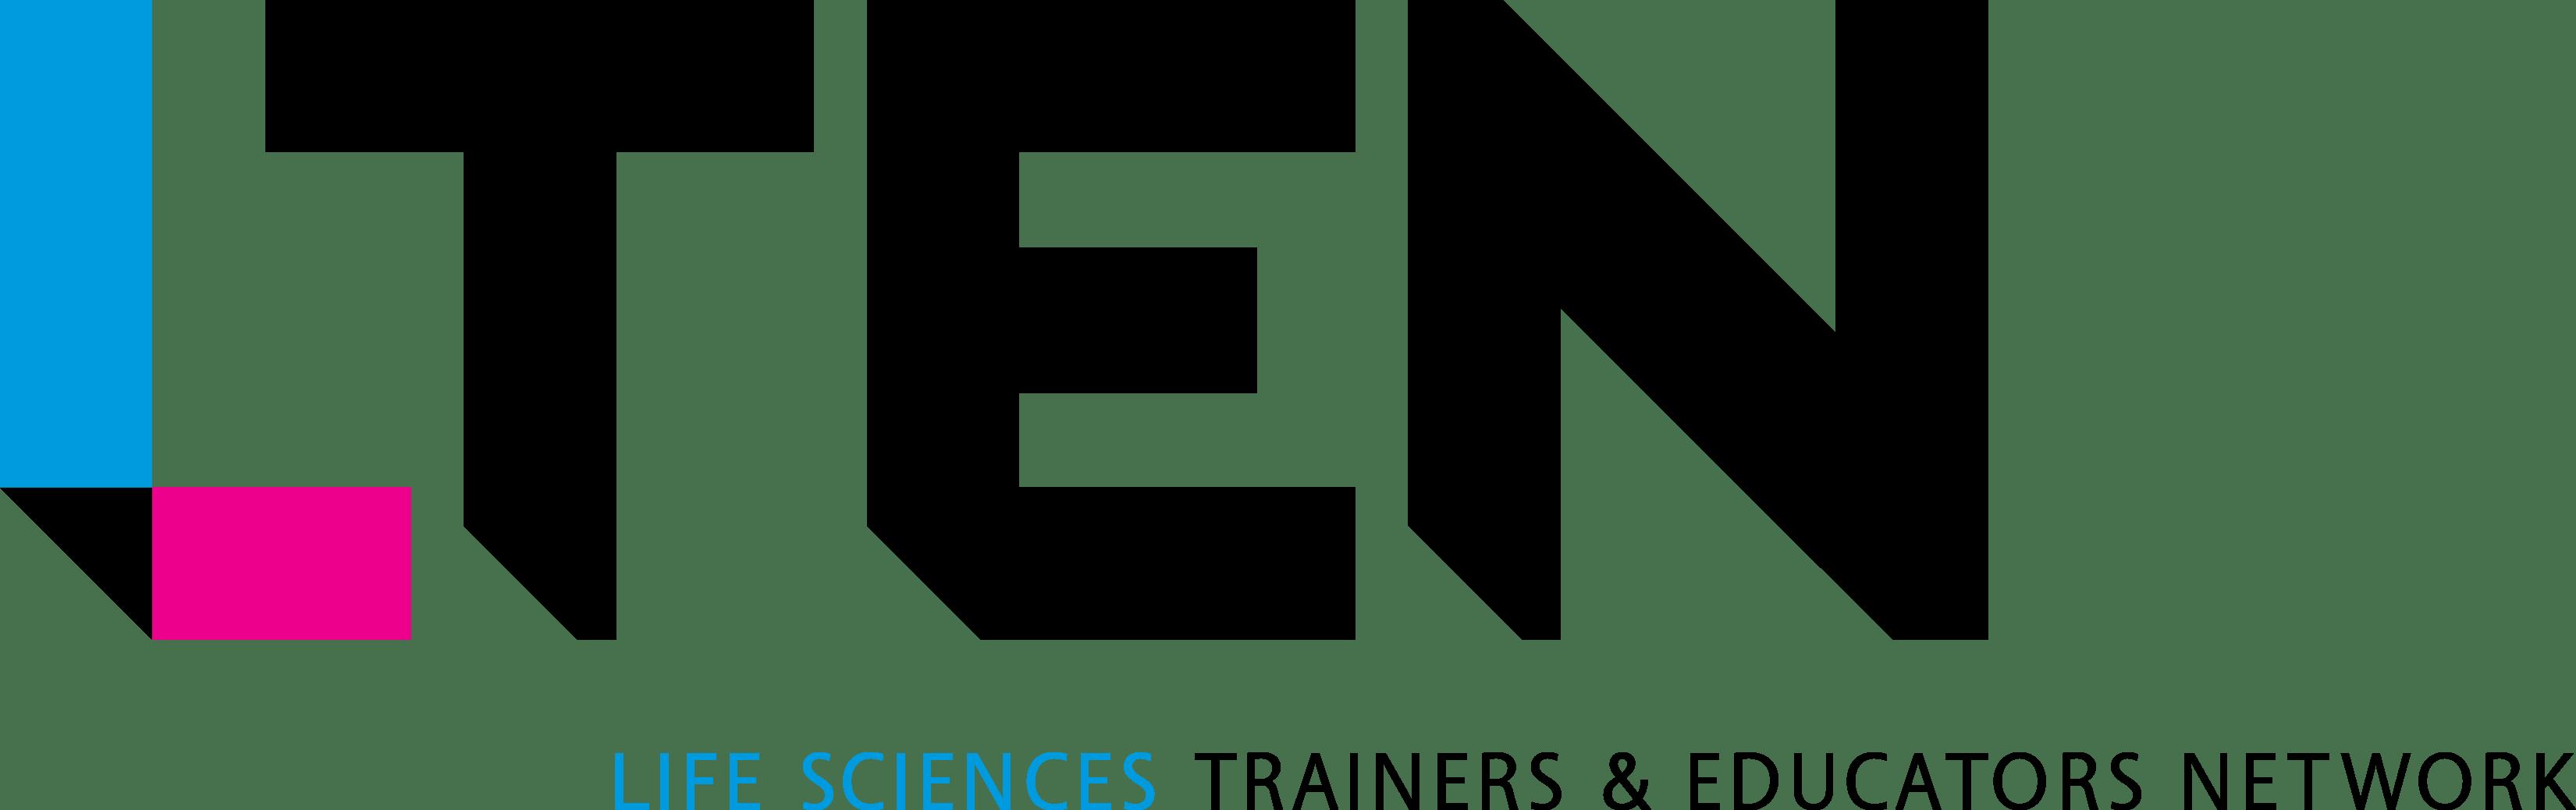 Life Sciences Trainers & Educators Network company logo